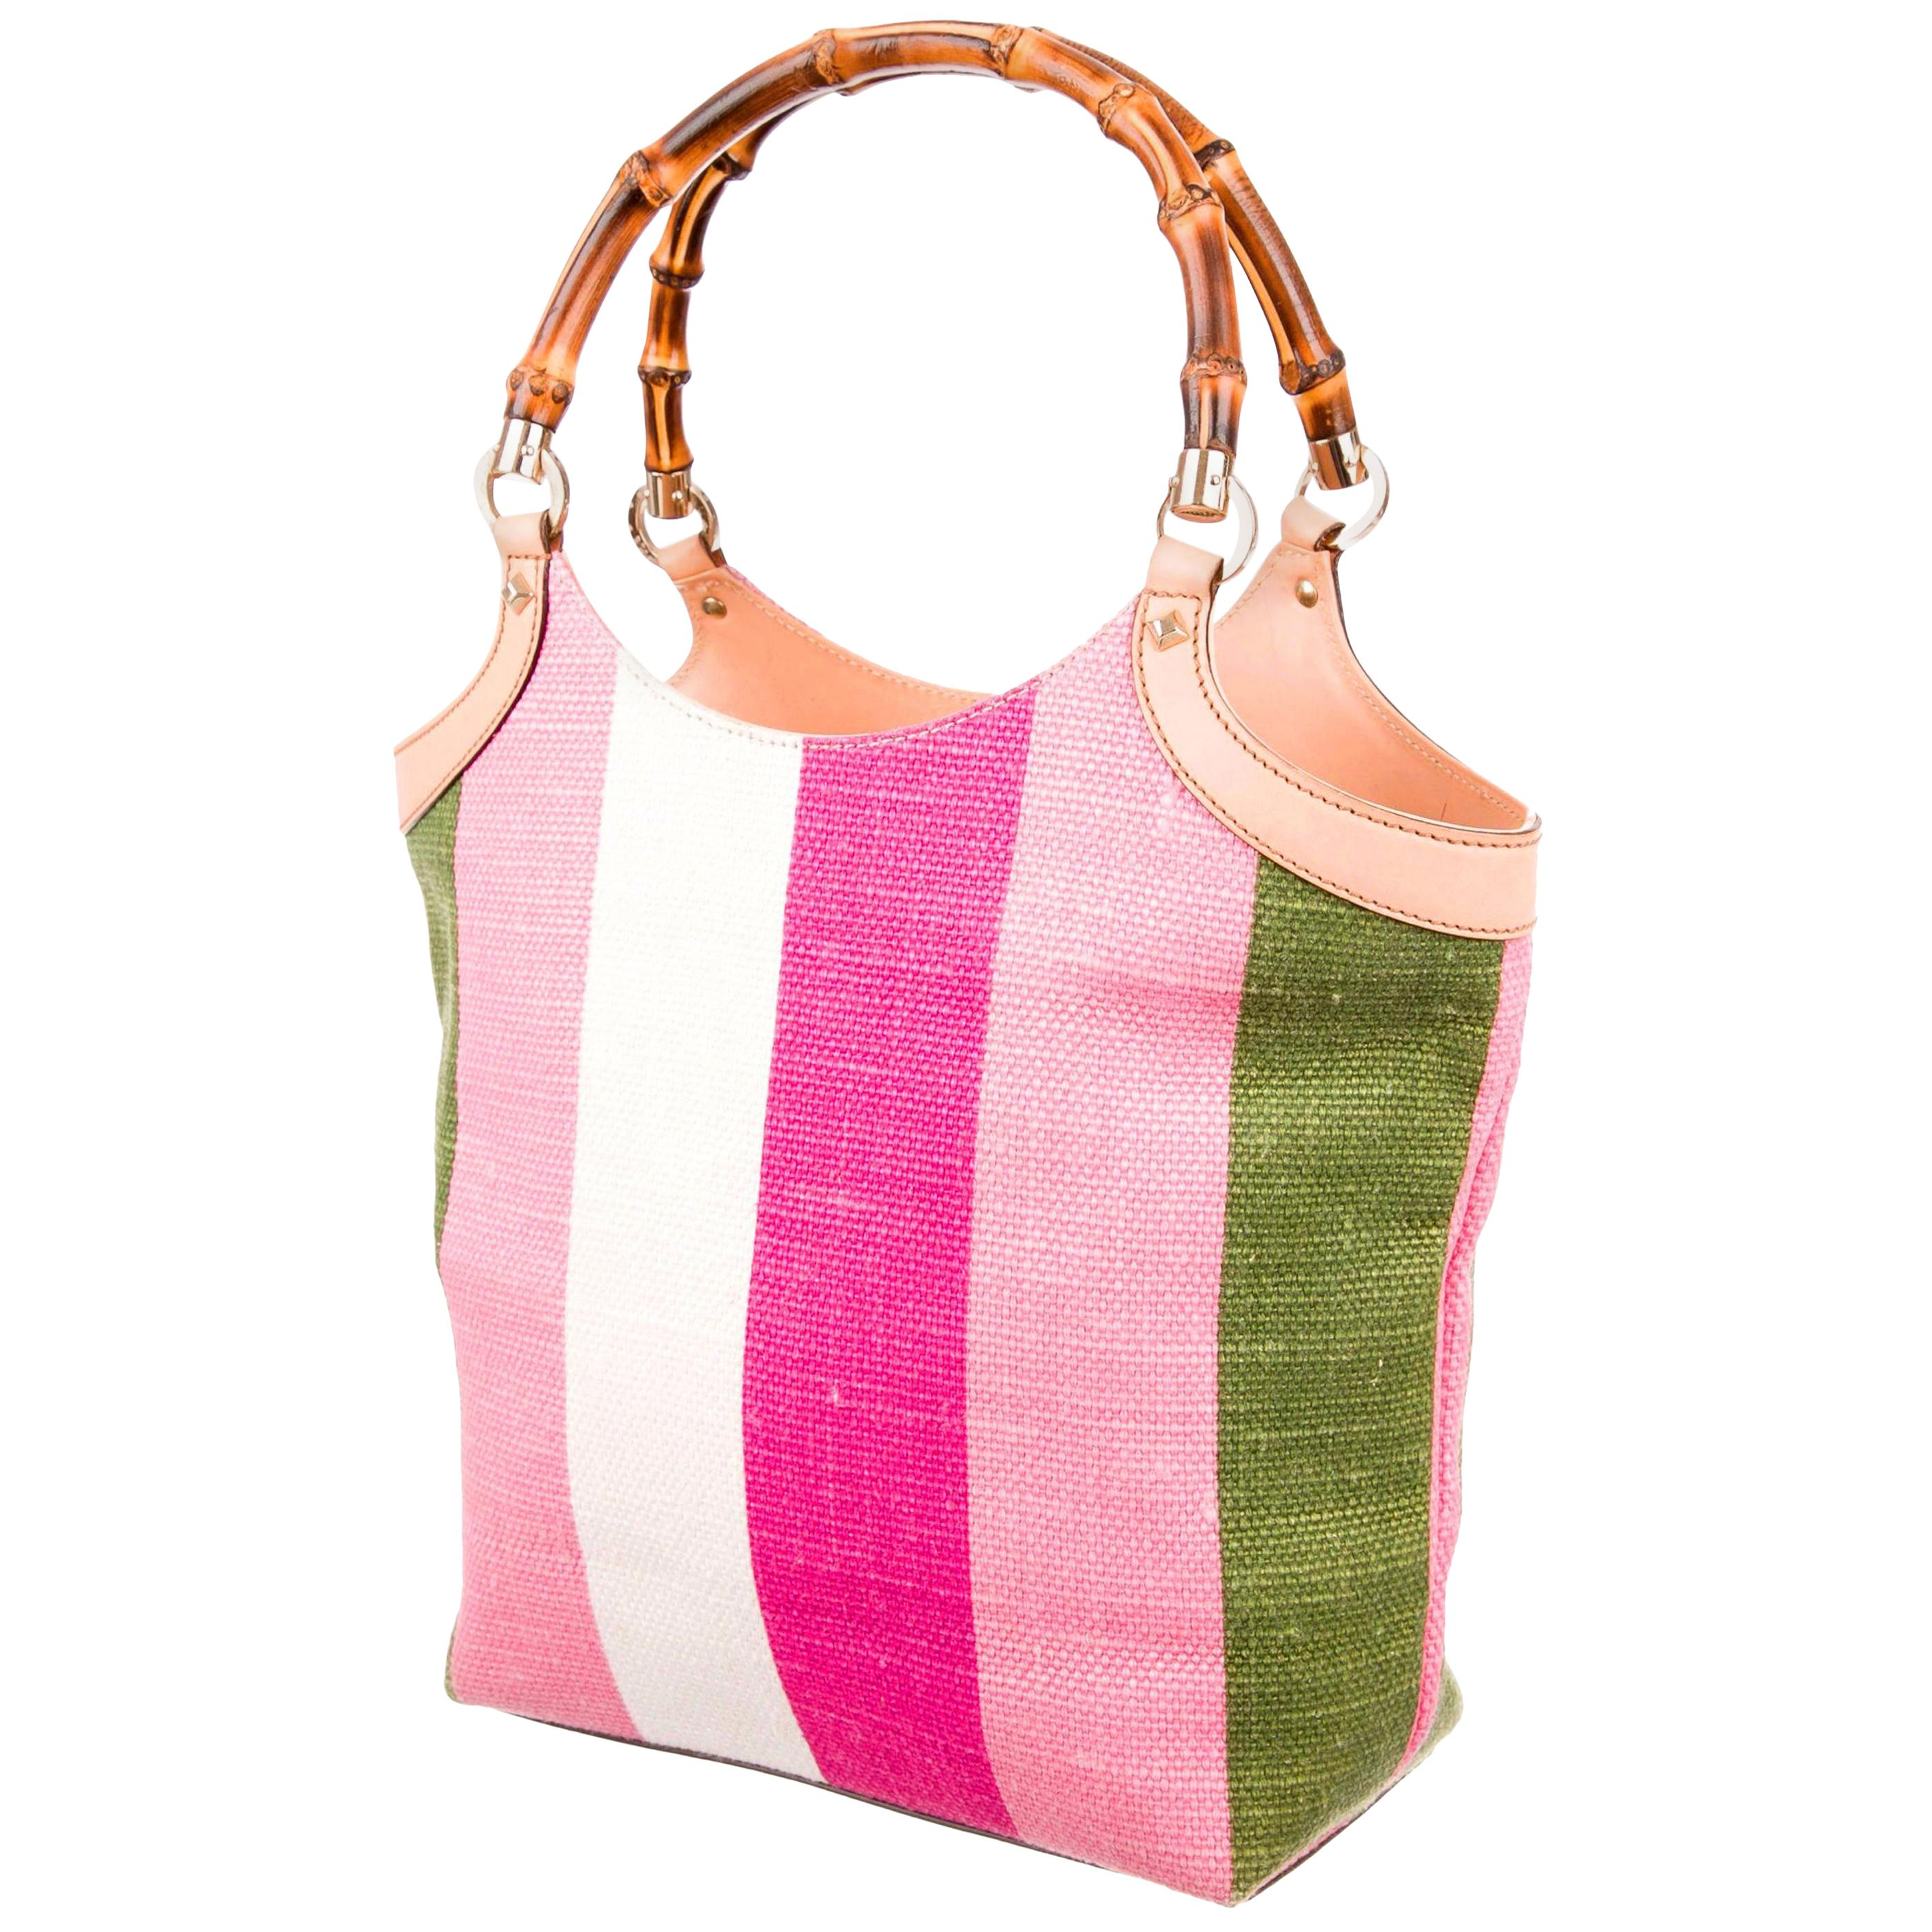 Gucci Striped Baiadera Canvas & Leather Bamboo Handbag Tote Bag with Studs